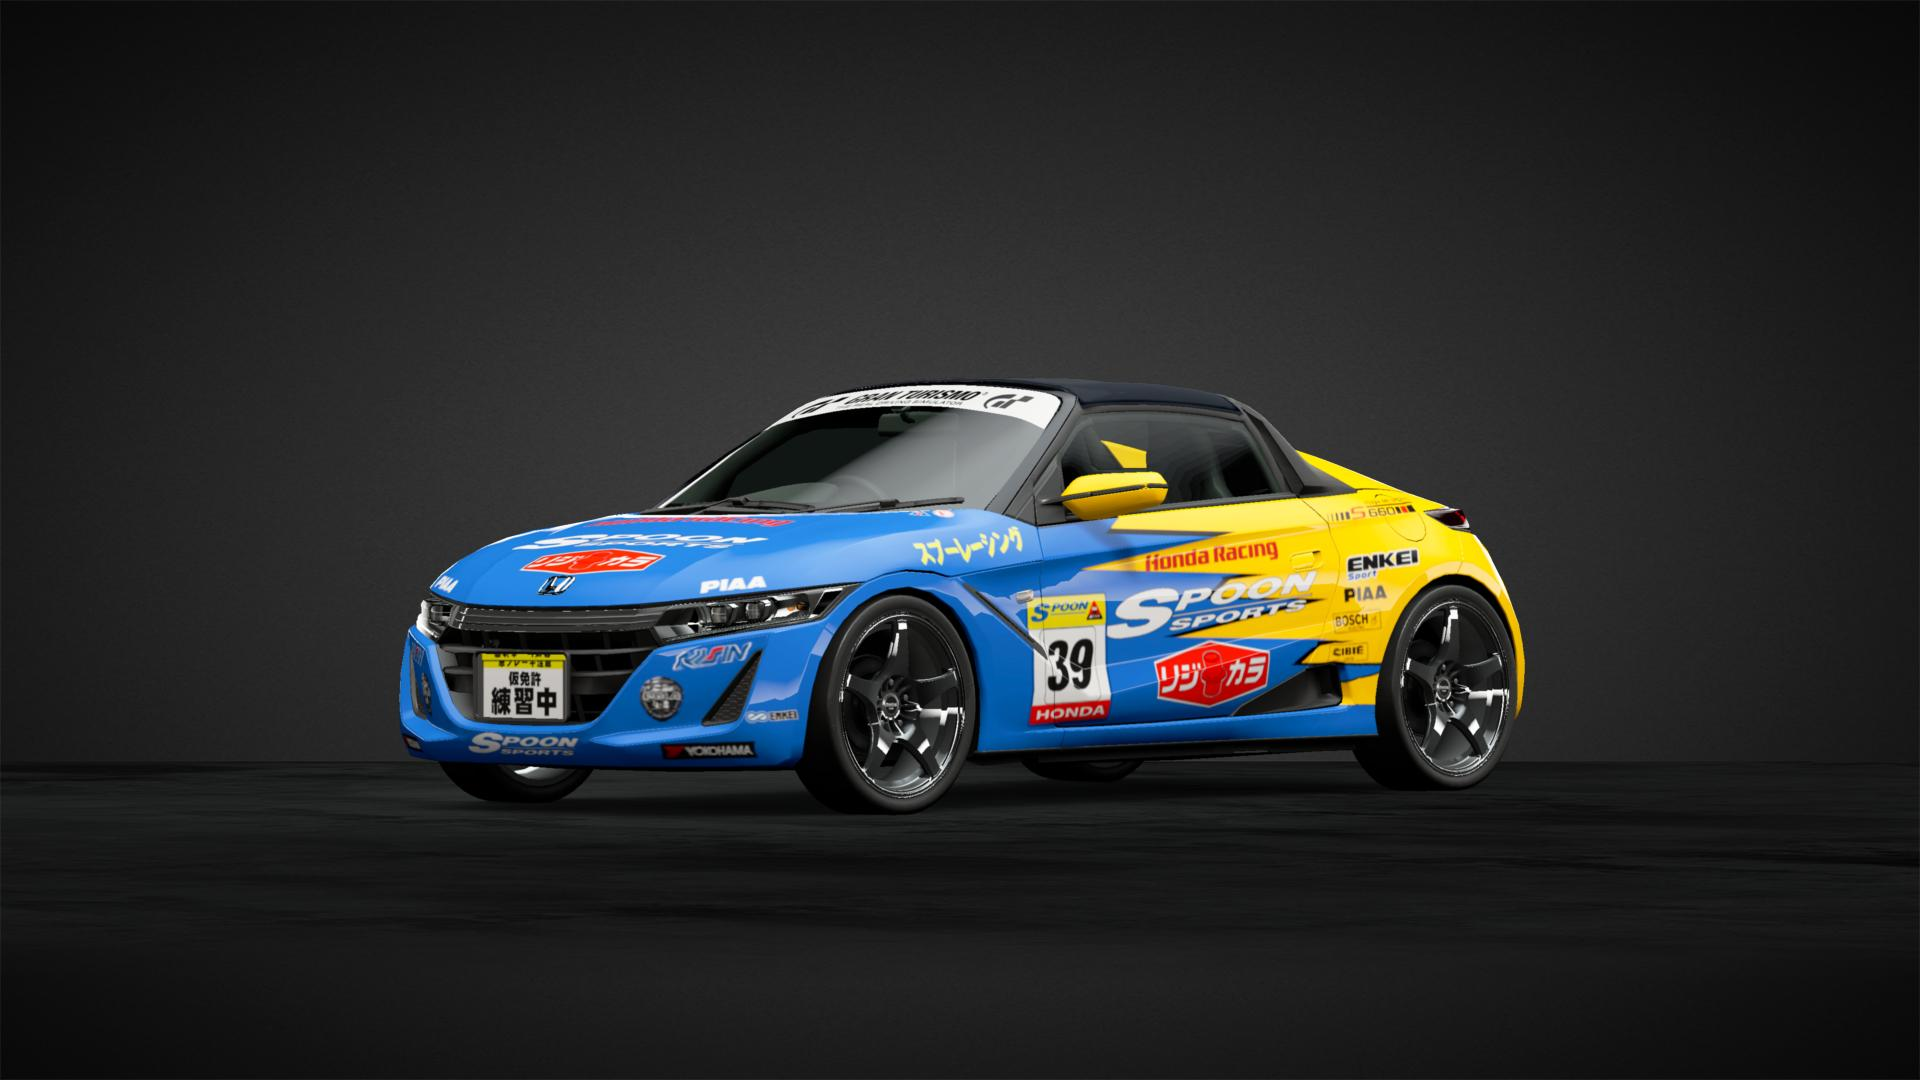 Honda S660 Spoon Racing Car Livery By Gutierrez 36 Community